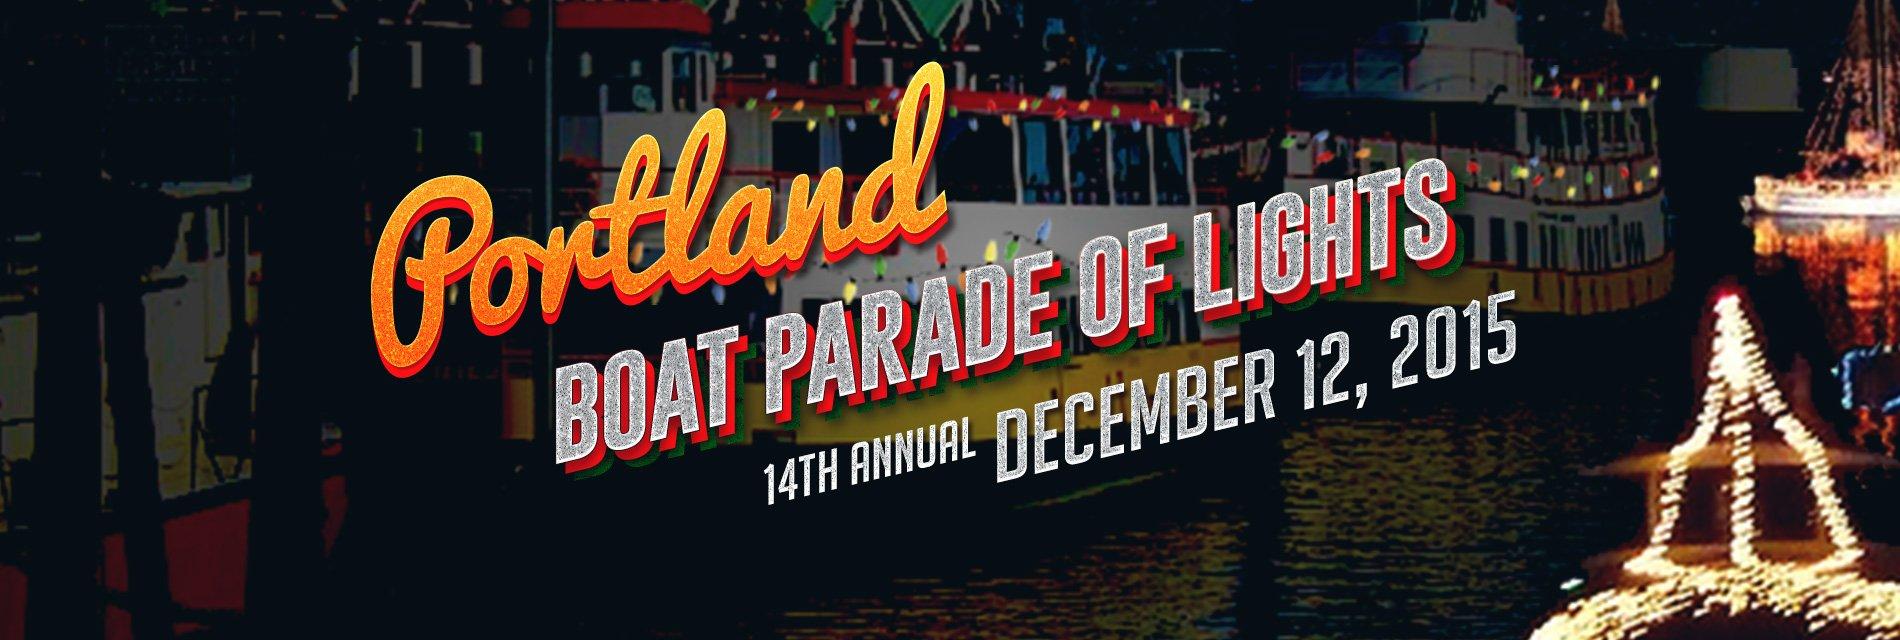 Portland-Maine-Boat-Parade-Ligths-2015